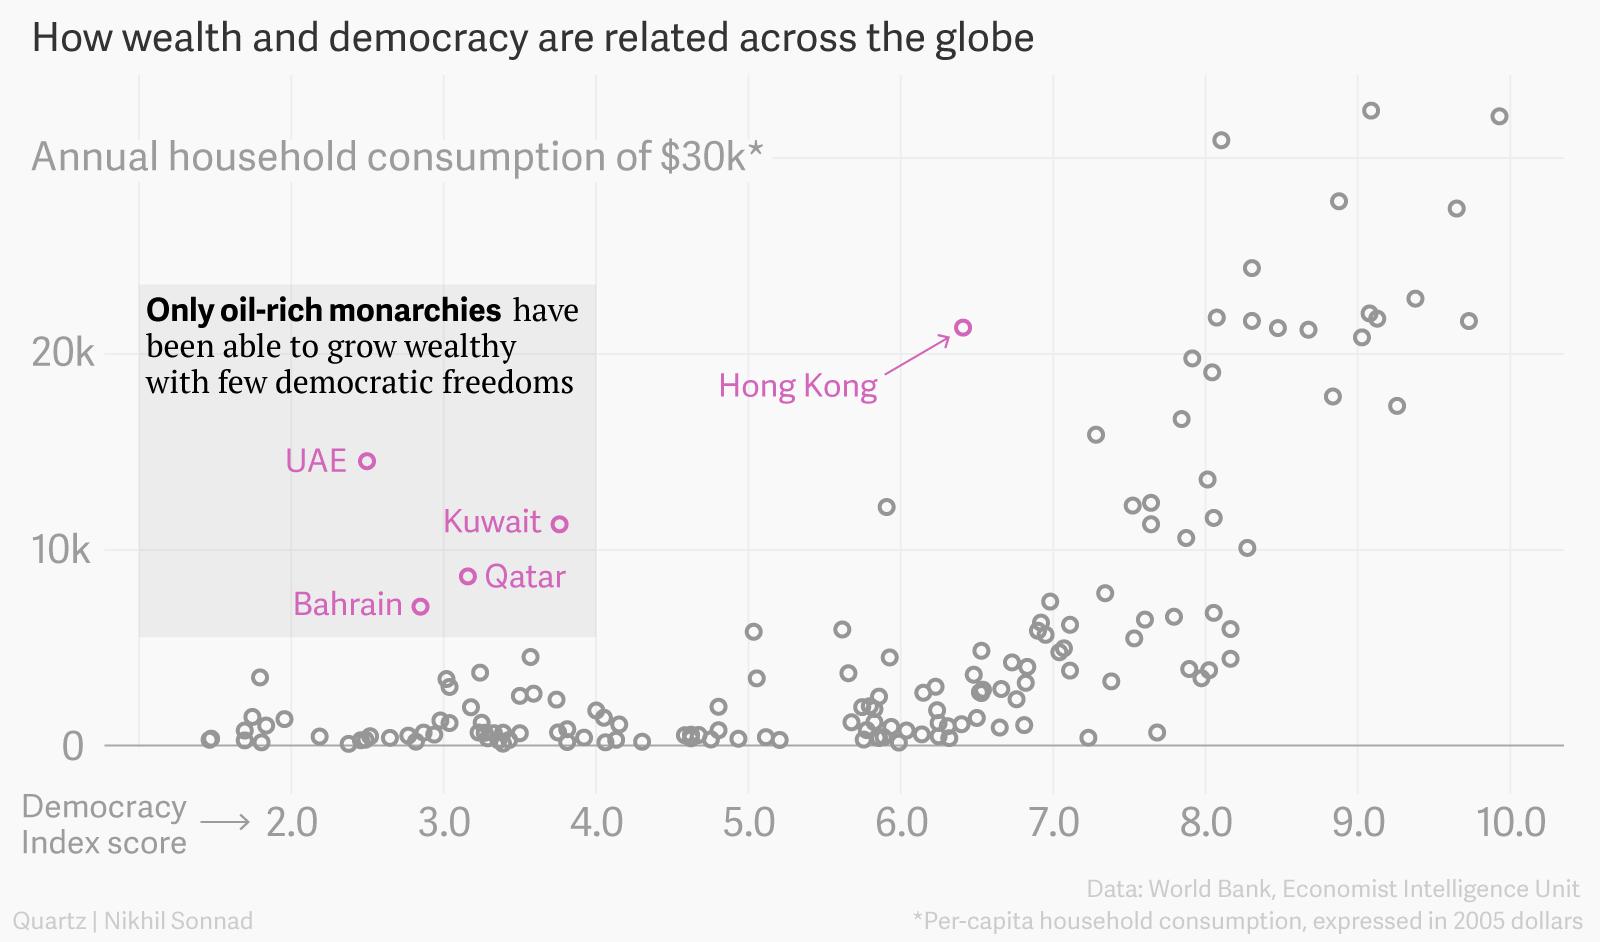 Consumption vs democracy chart